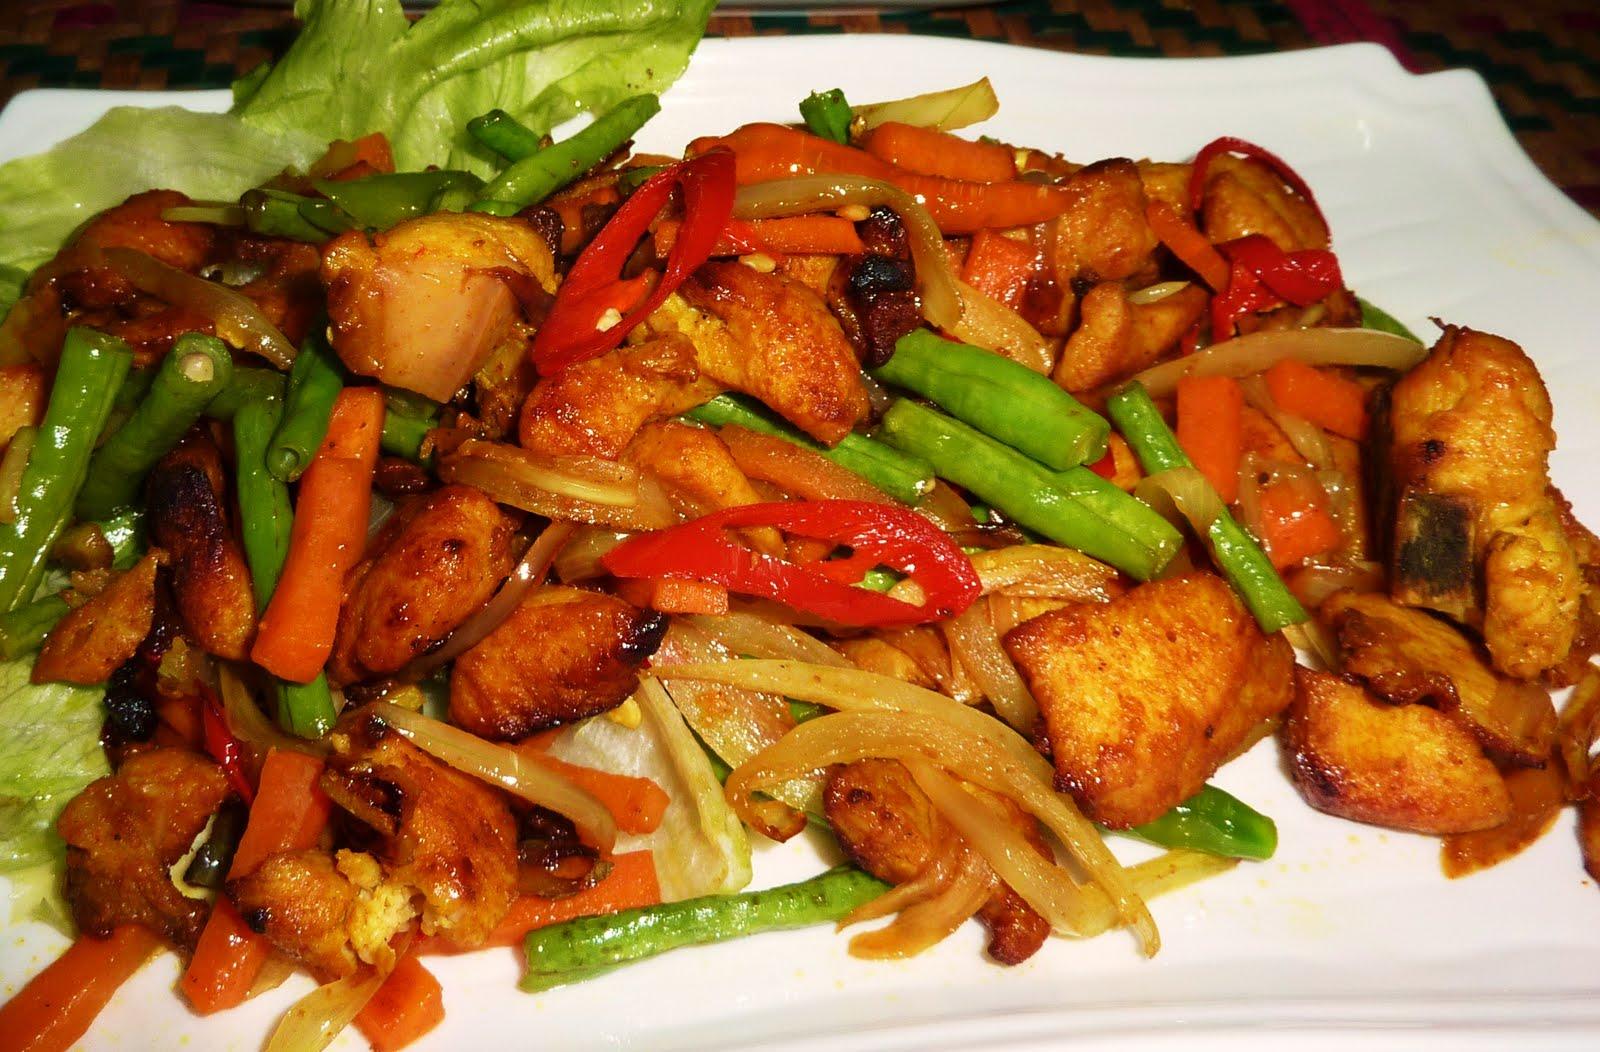 Korang Ingat Time Diet Takleh Makan Ayam? 4 Resepi Cara Masak Ayam Dengan Sihat Yang Awesome